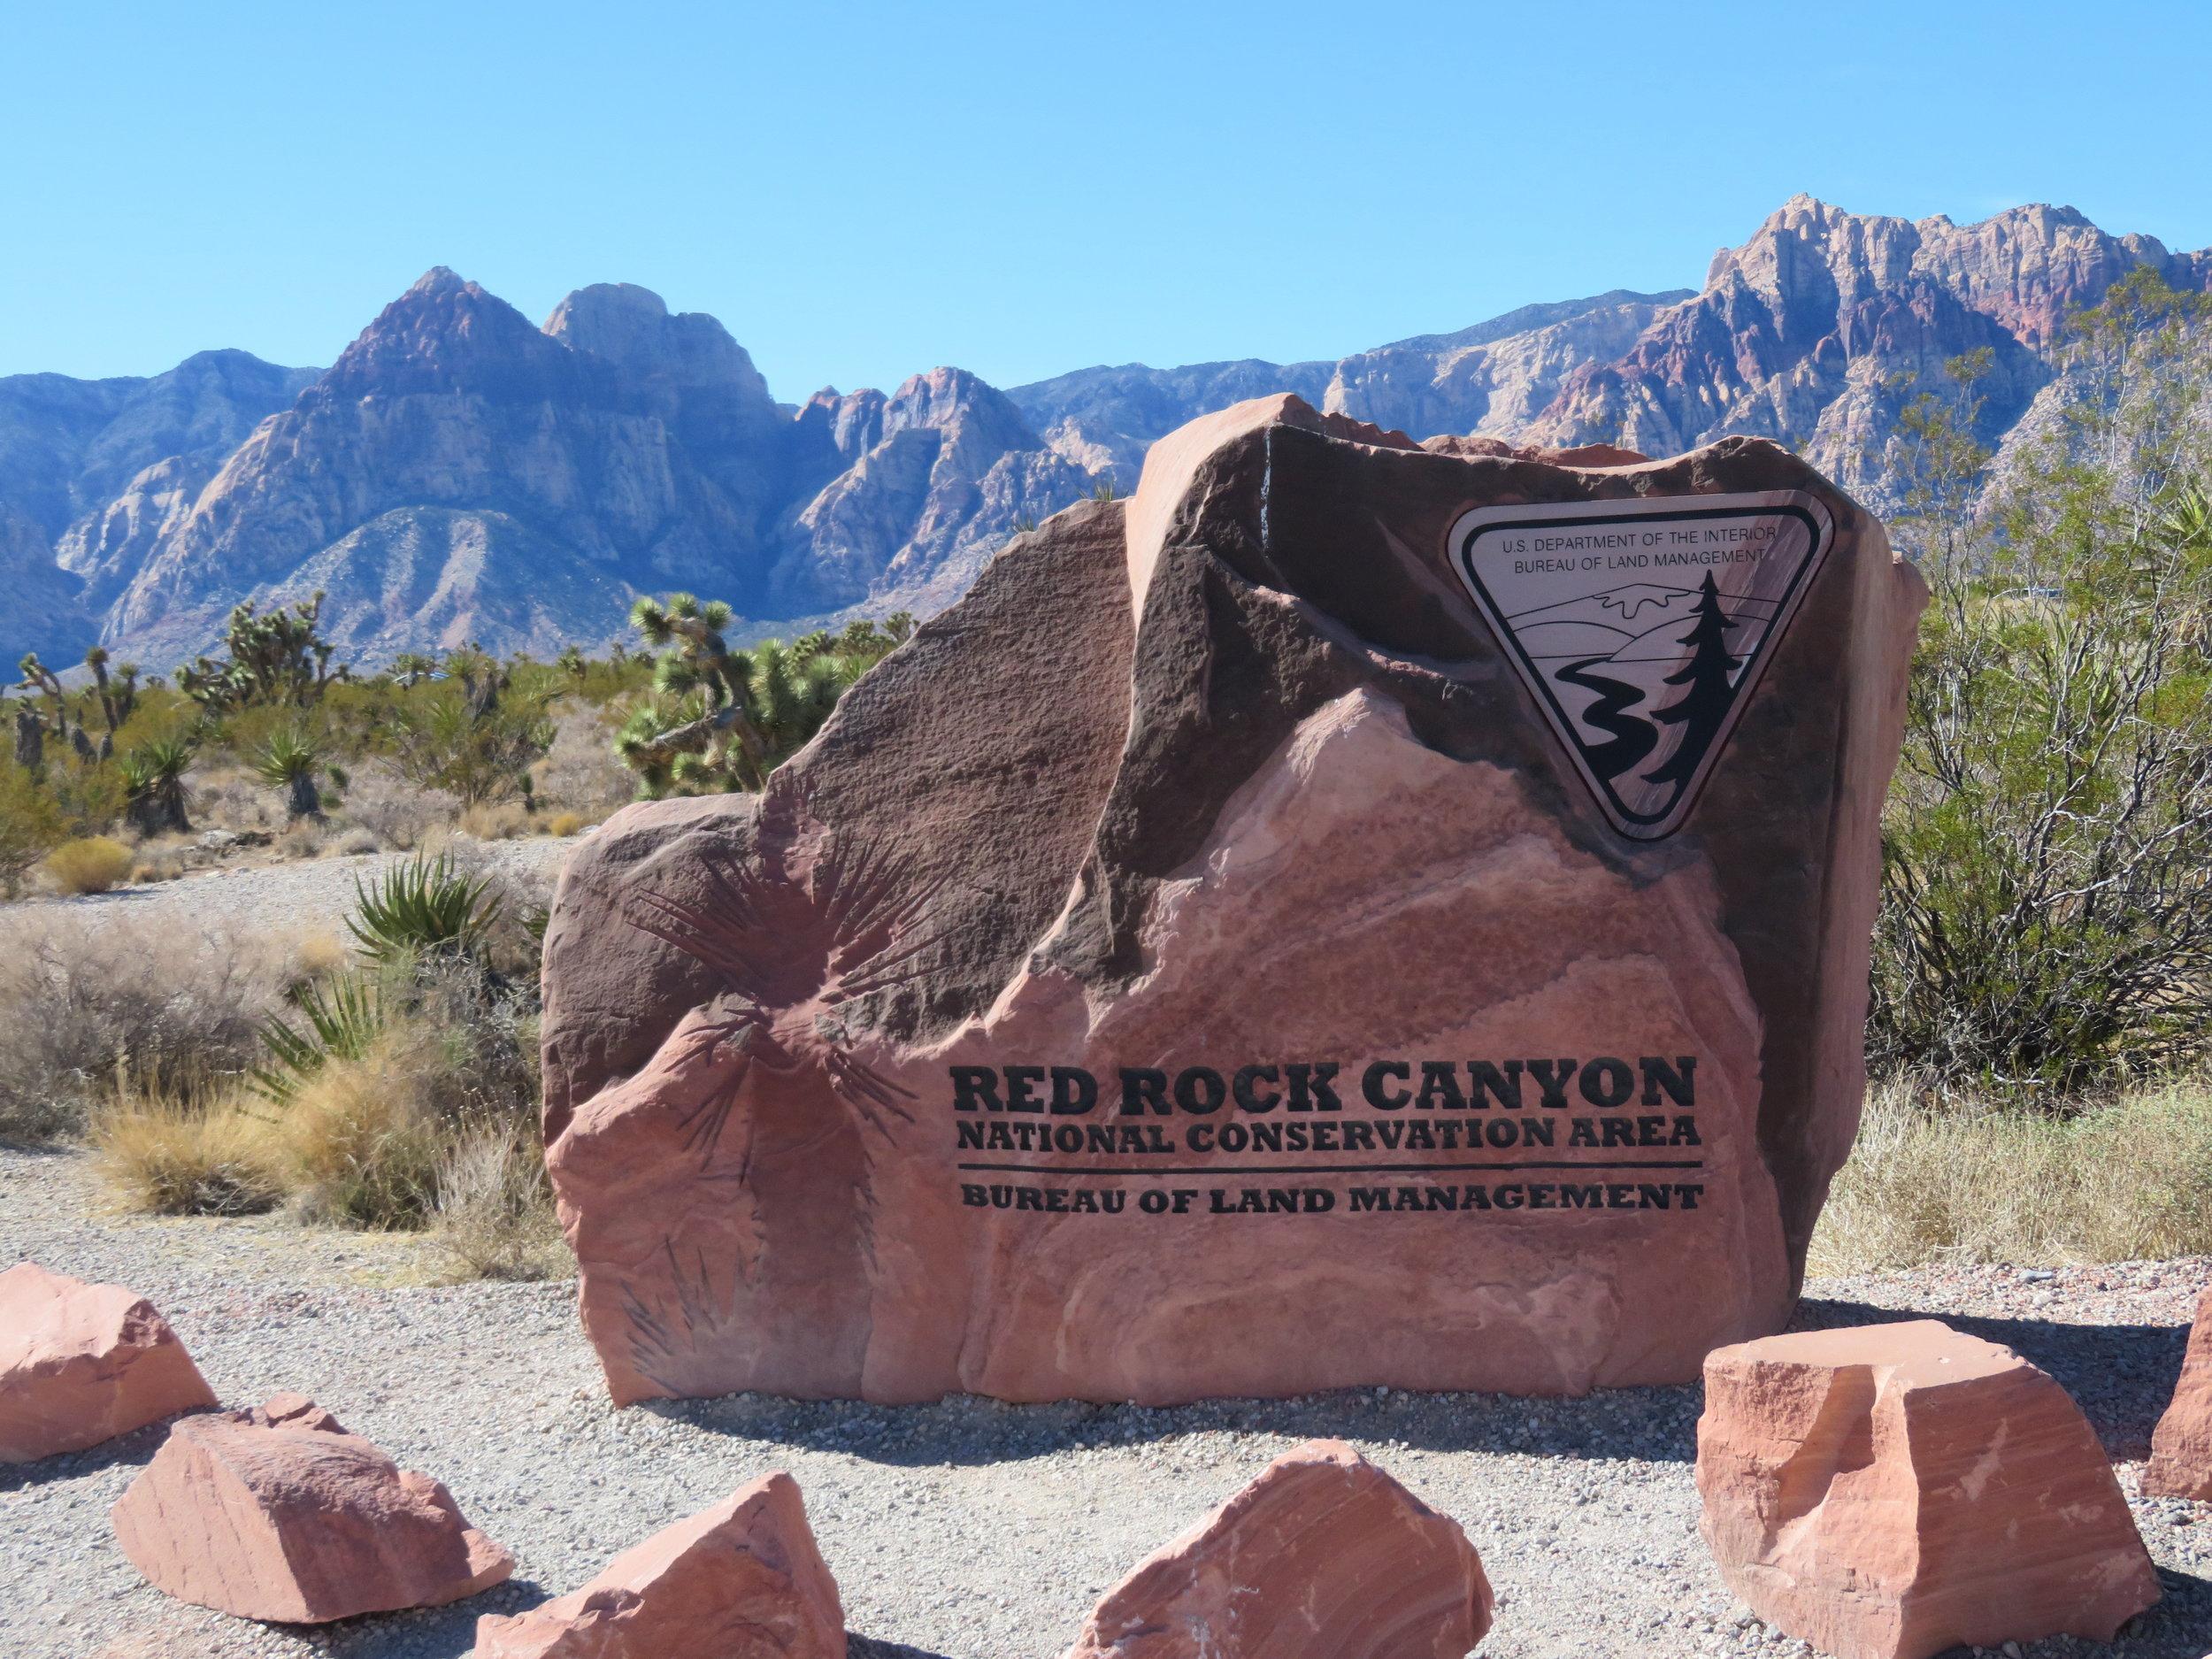 redrock_red rock canyon sign.JPG